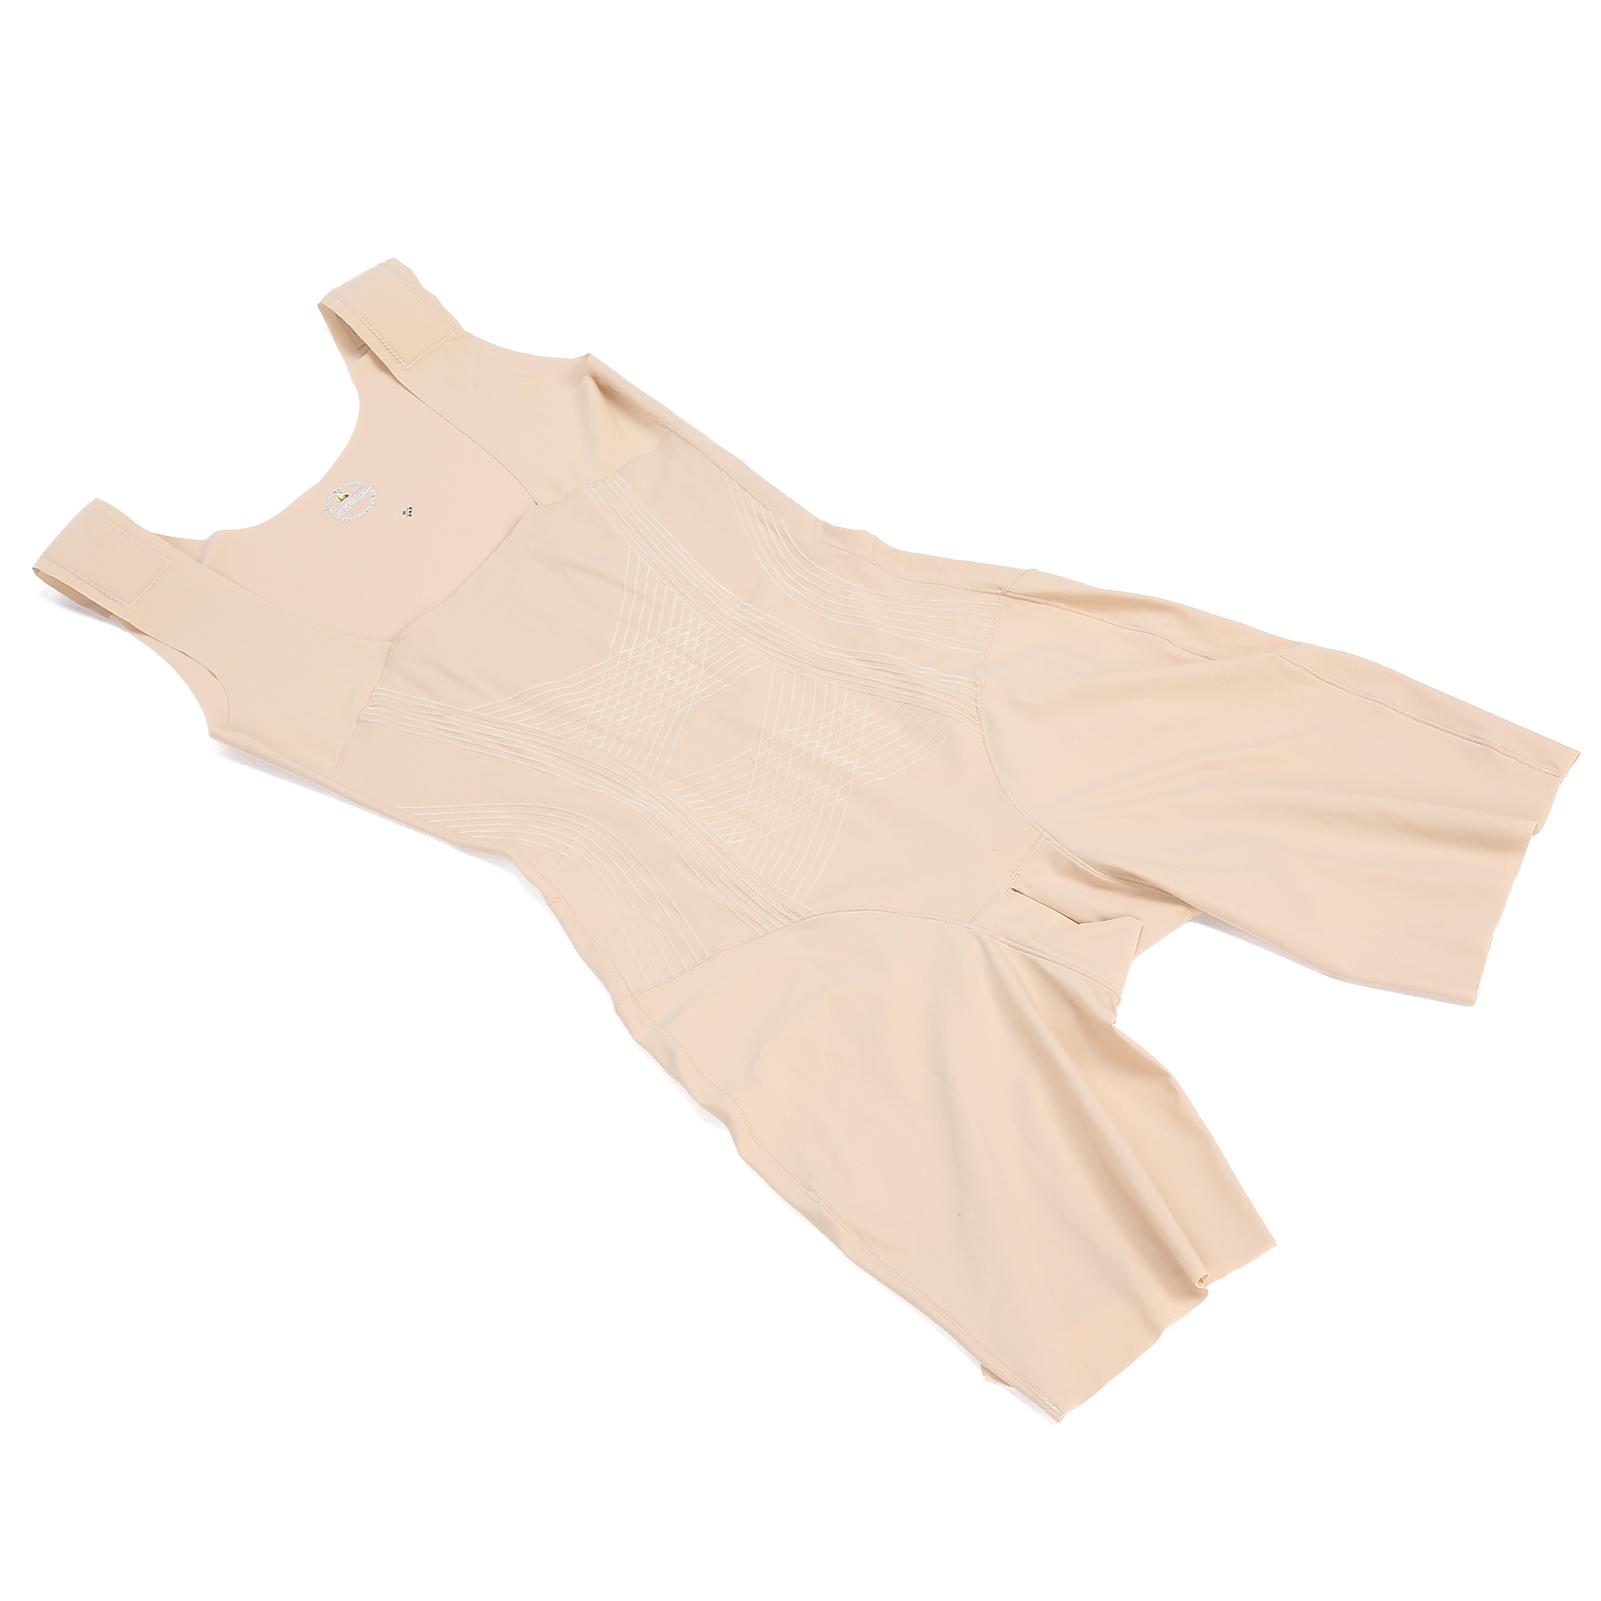 miniature 23 - Women's Full Body Taille Trainer Shaper Taille Corset underbust corset shapewear